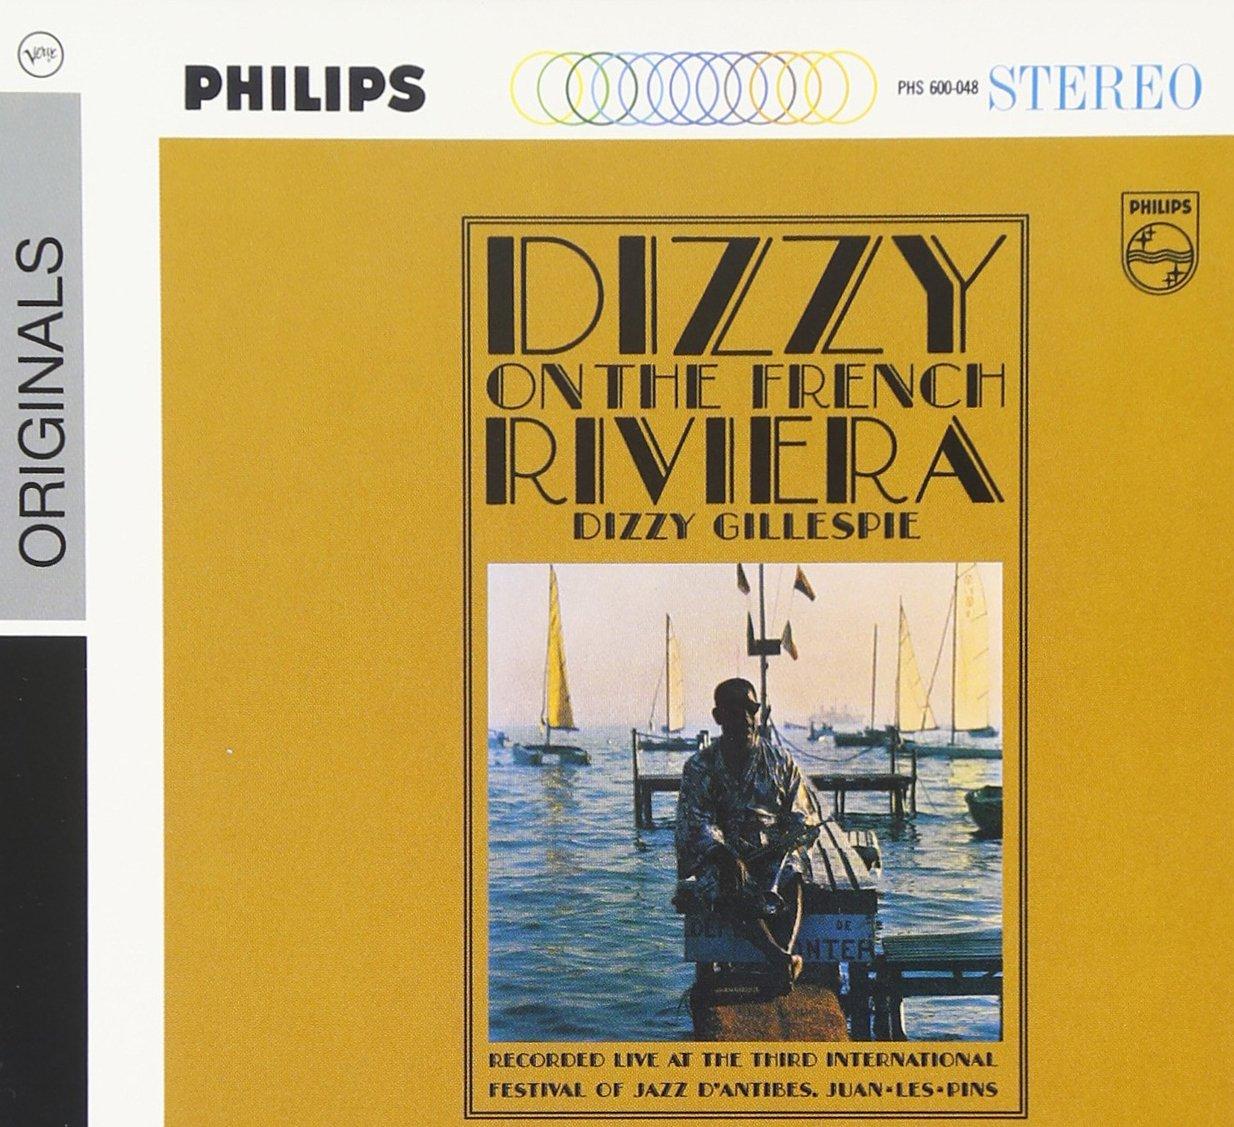 Dizzy On The French Riviera by Gillespie, Dizzy